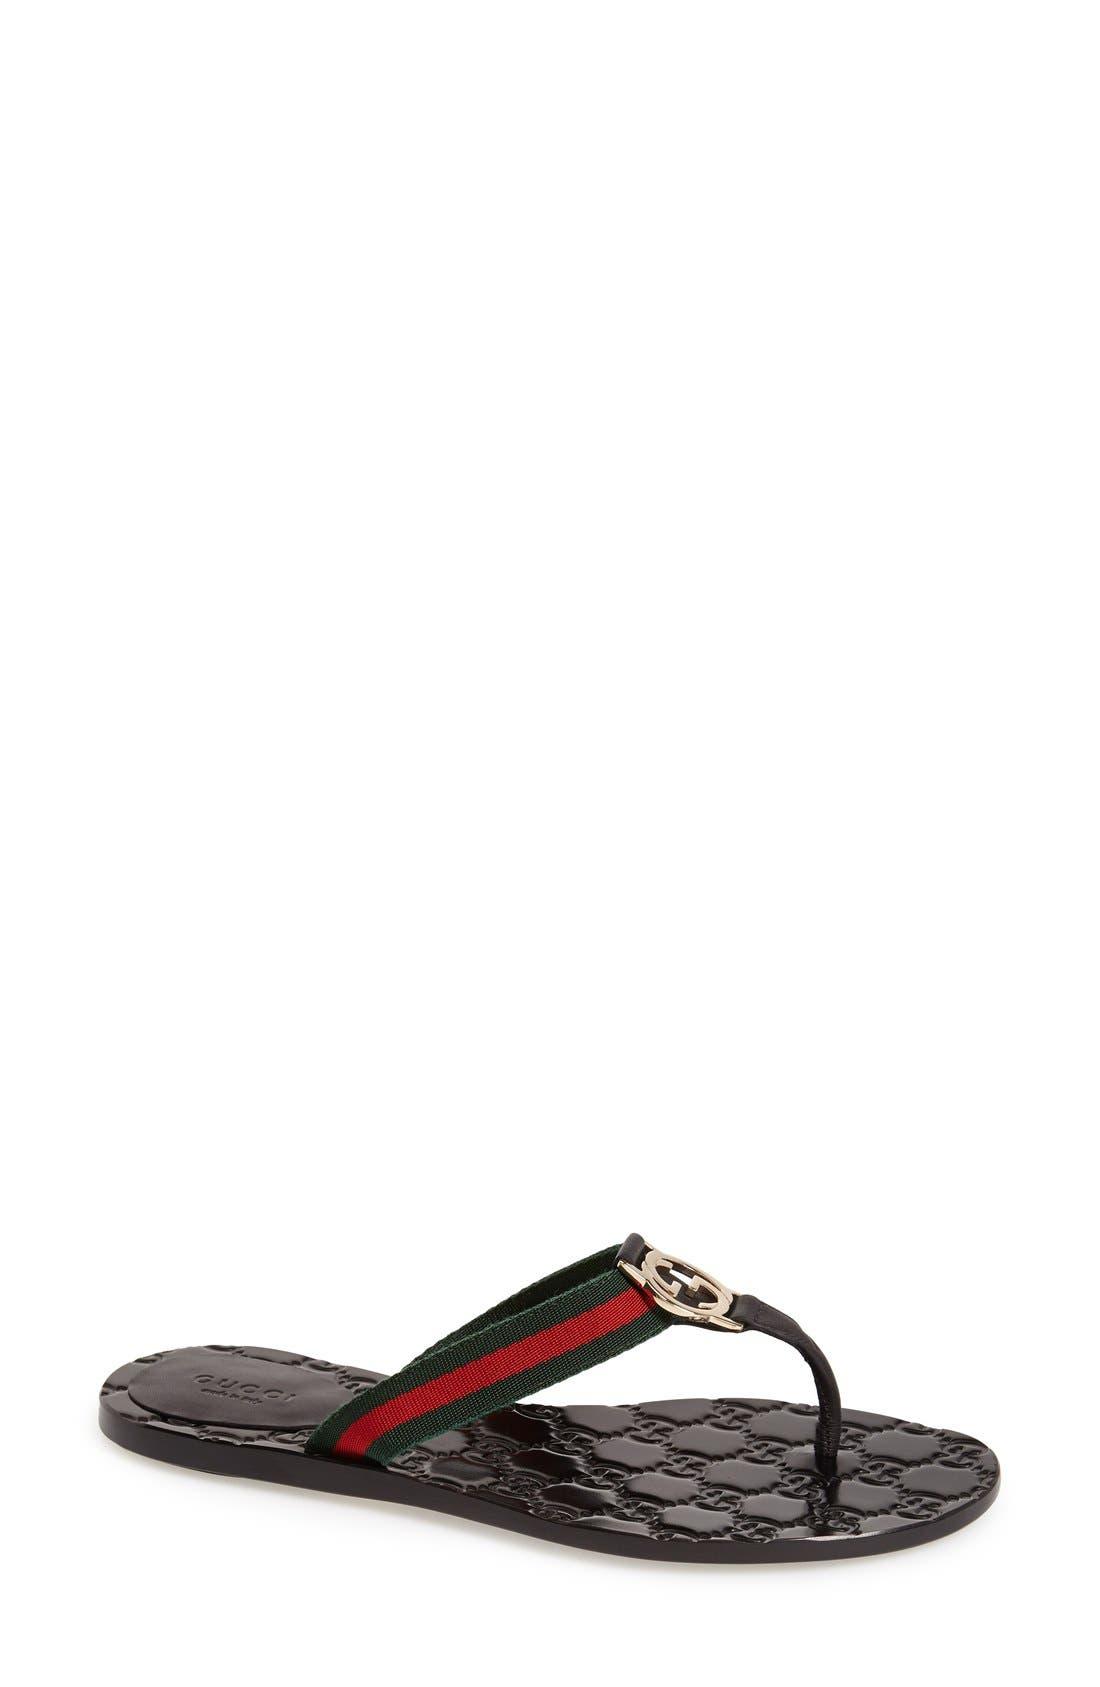 'GG' Logo Sandal,                         Main,                         color, Nero